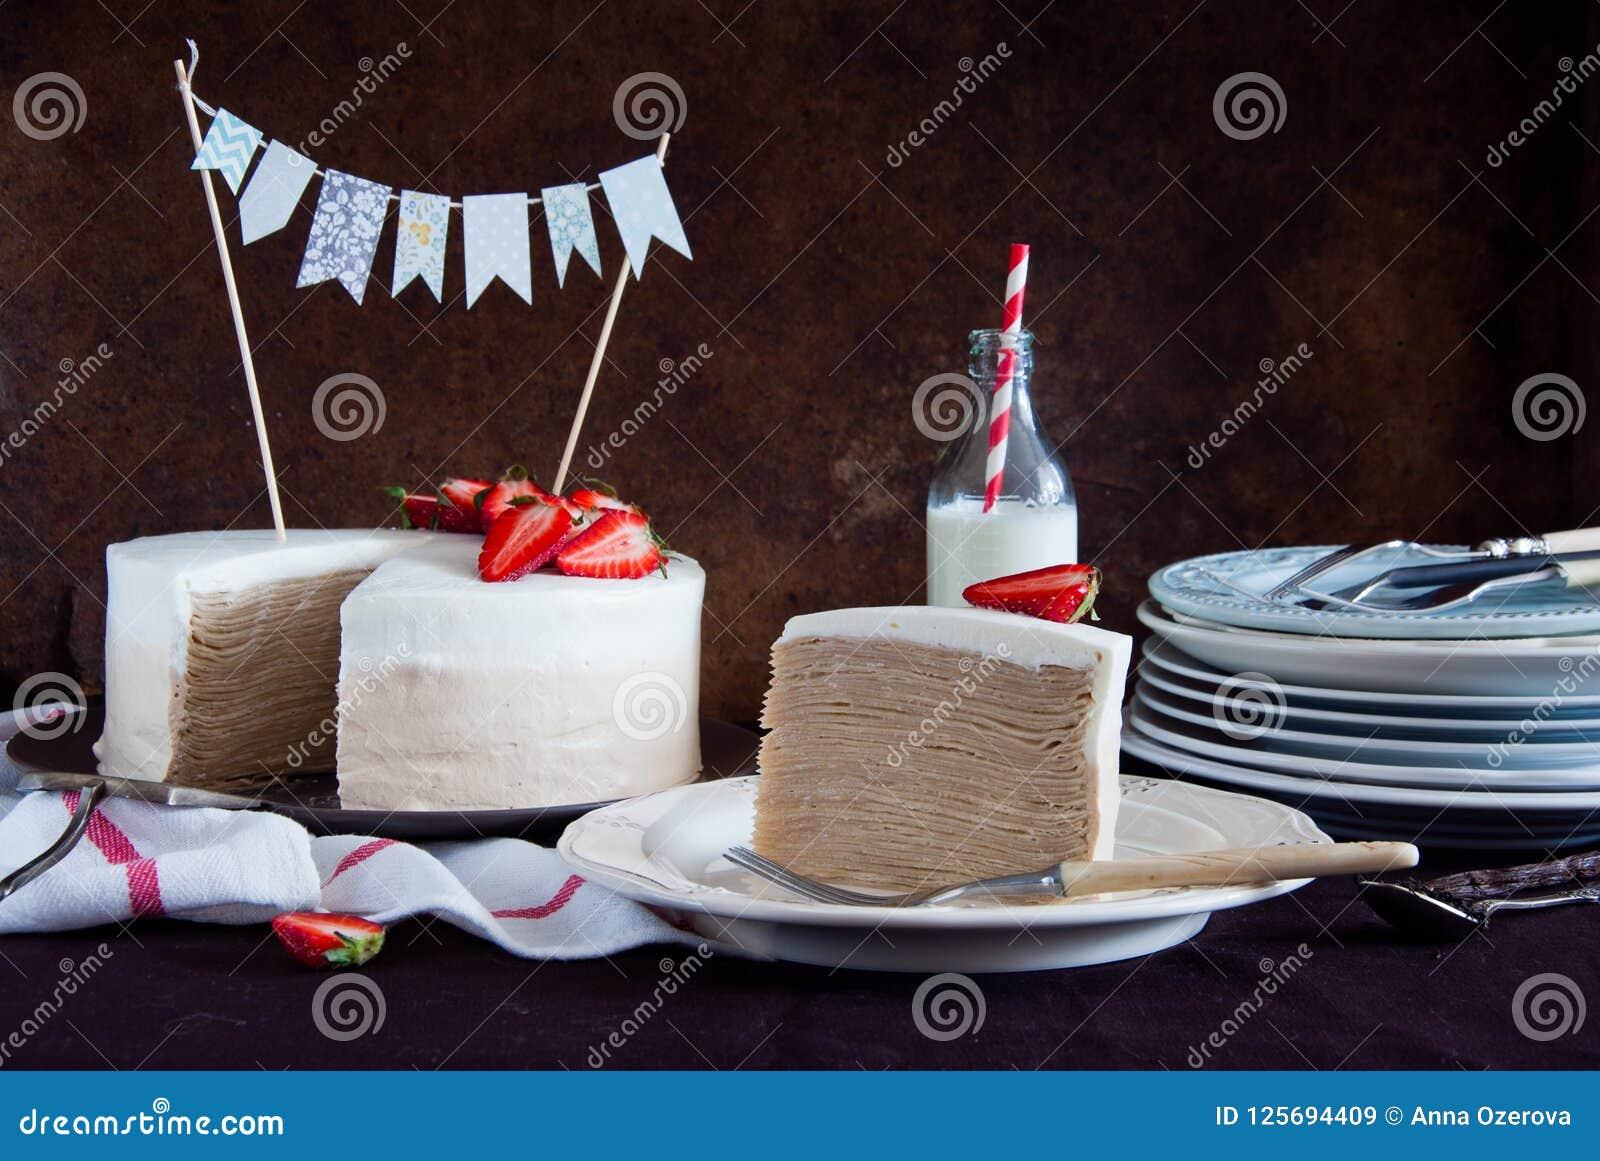 Crepe Cake Napoleon With Strawberries Stock Image Image Of Cream